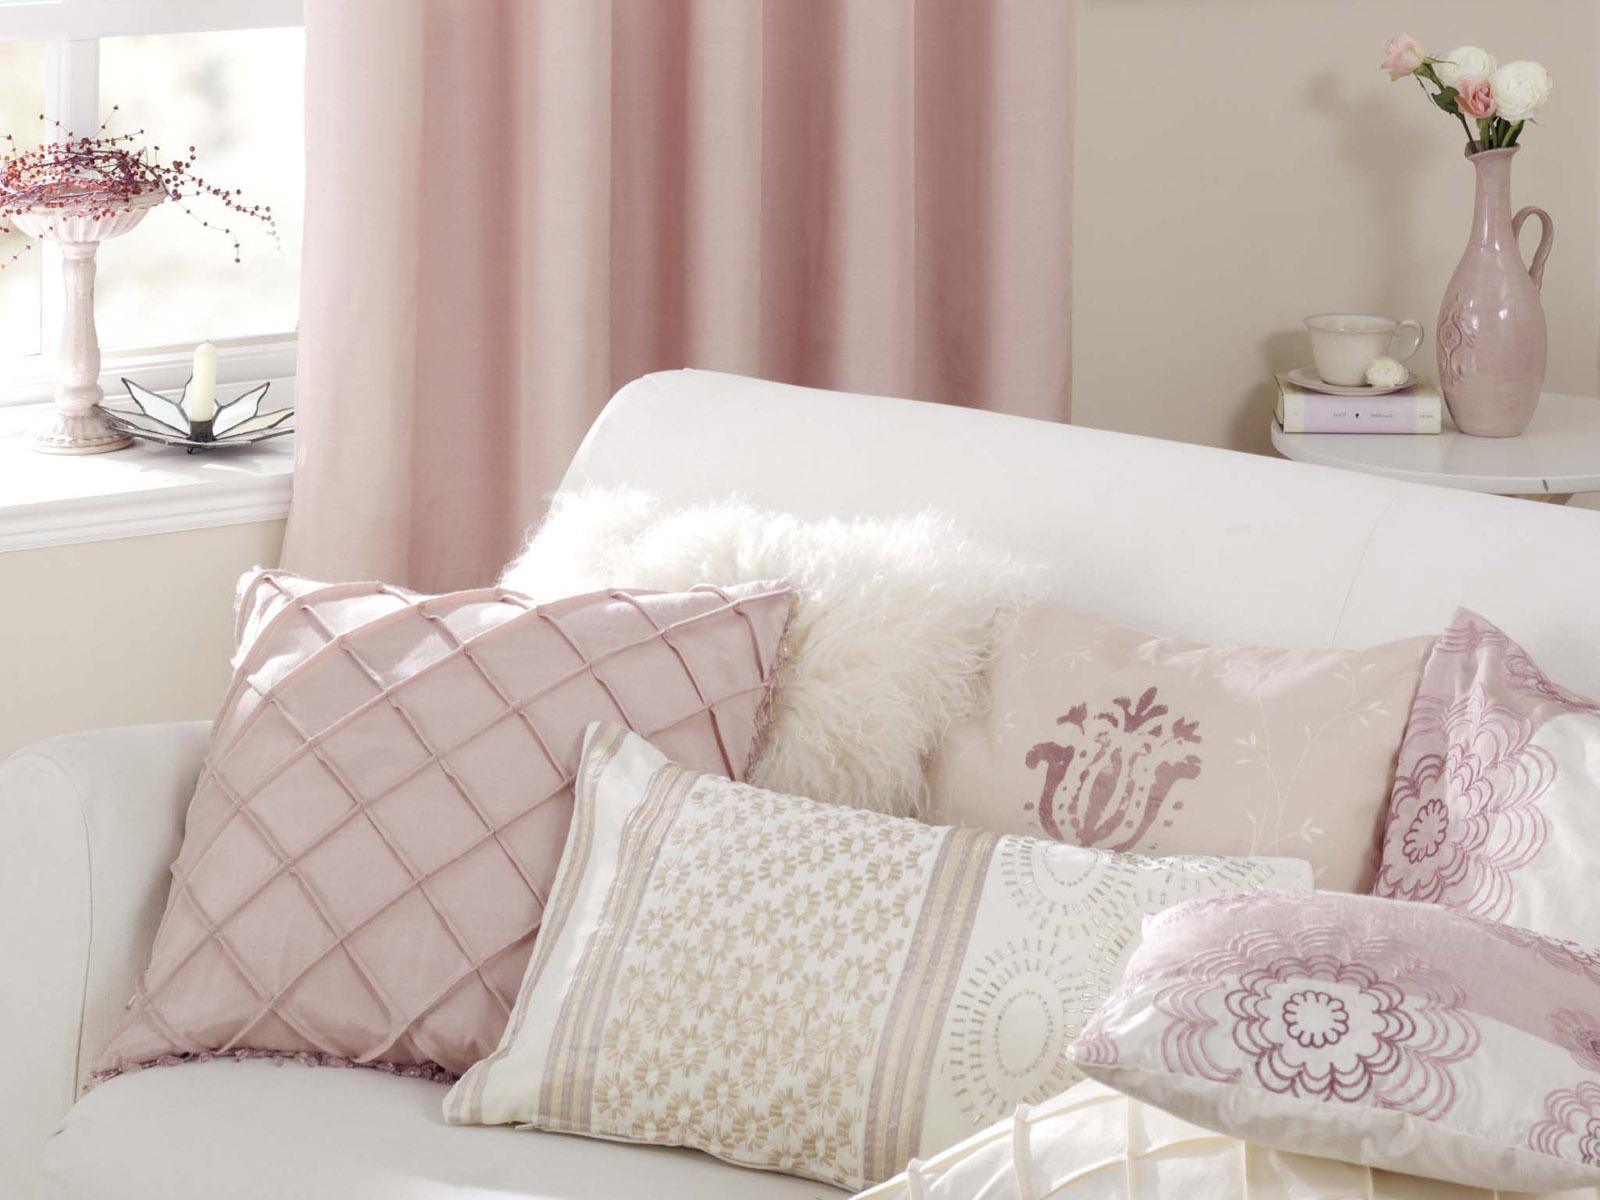 Soft-Living-Room-Cusions Soft Living Room Cusions